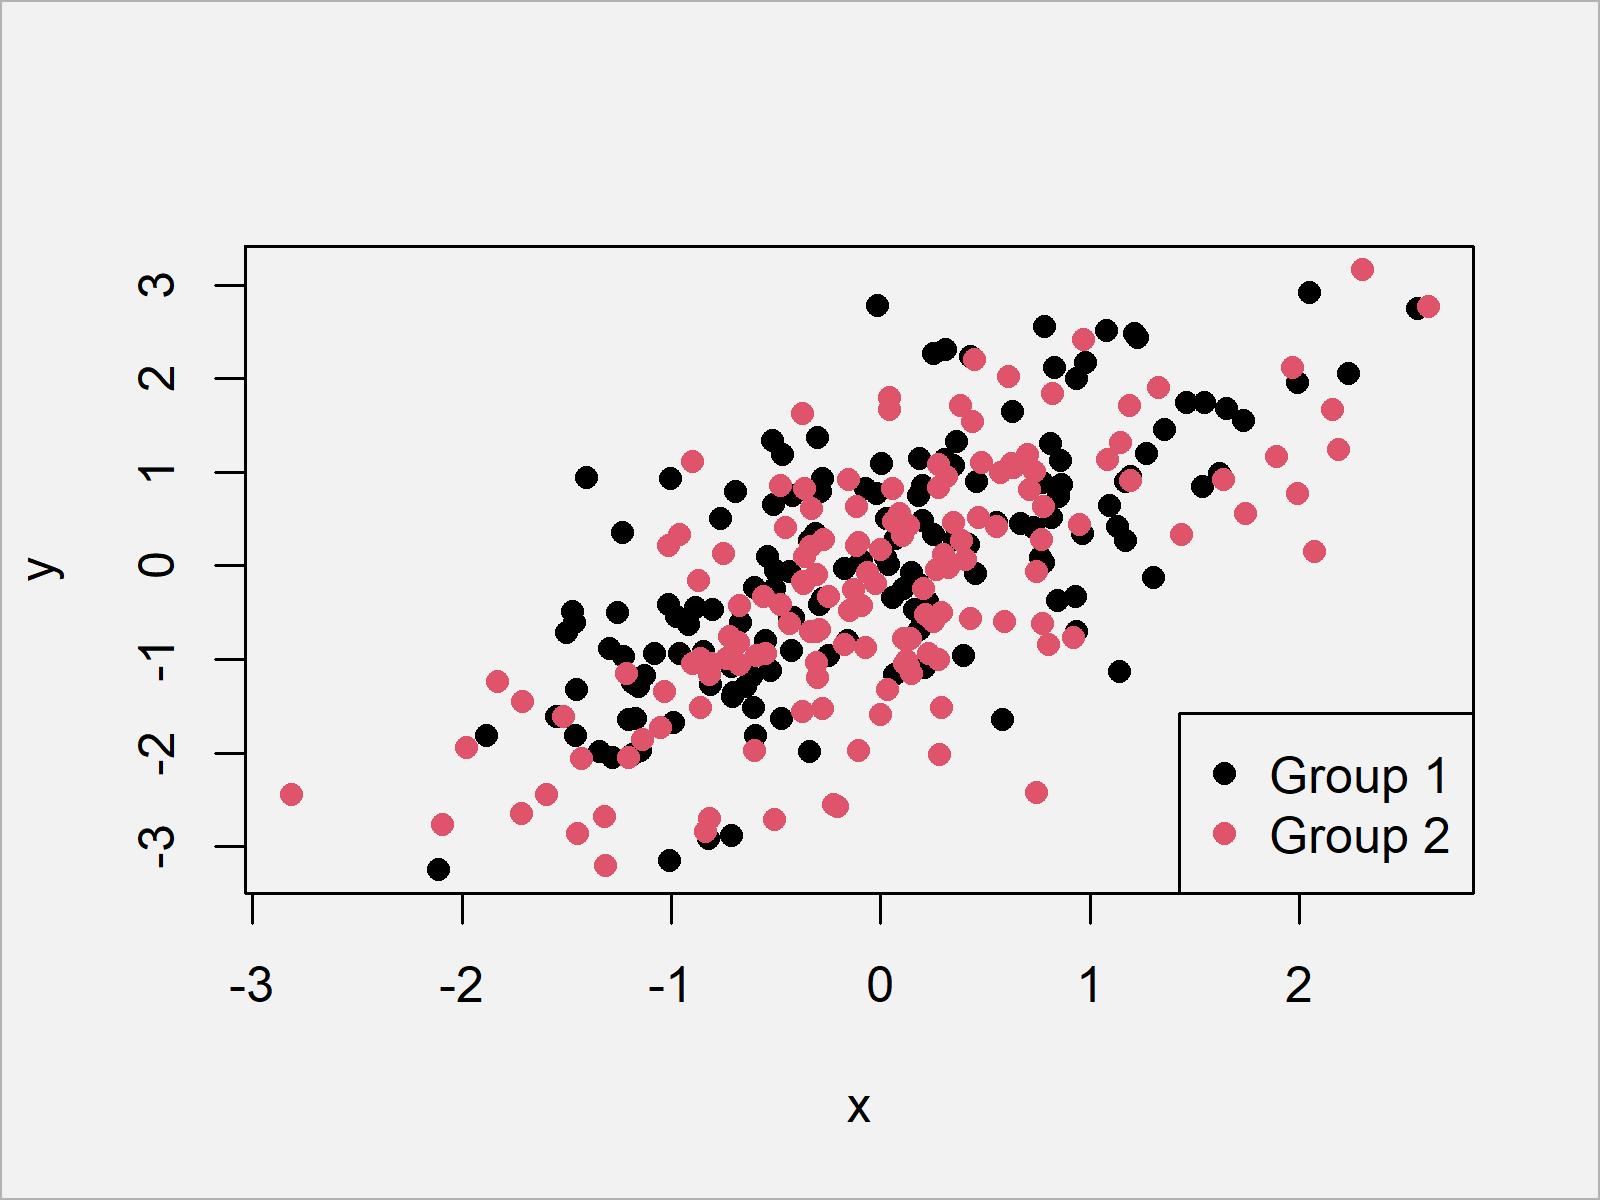 r graph figure 3 add legend base